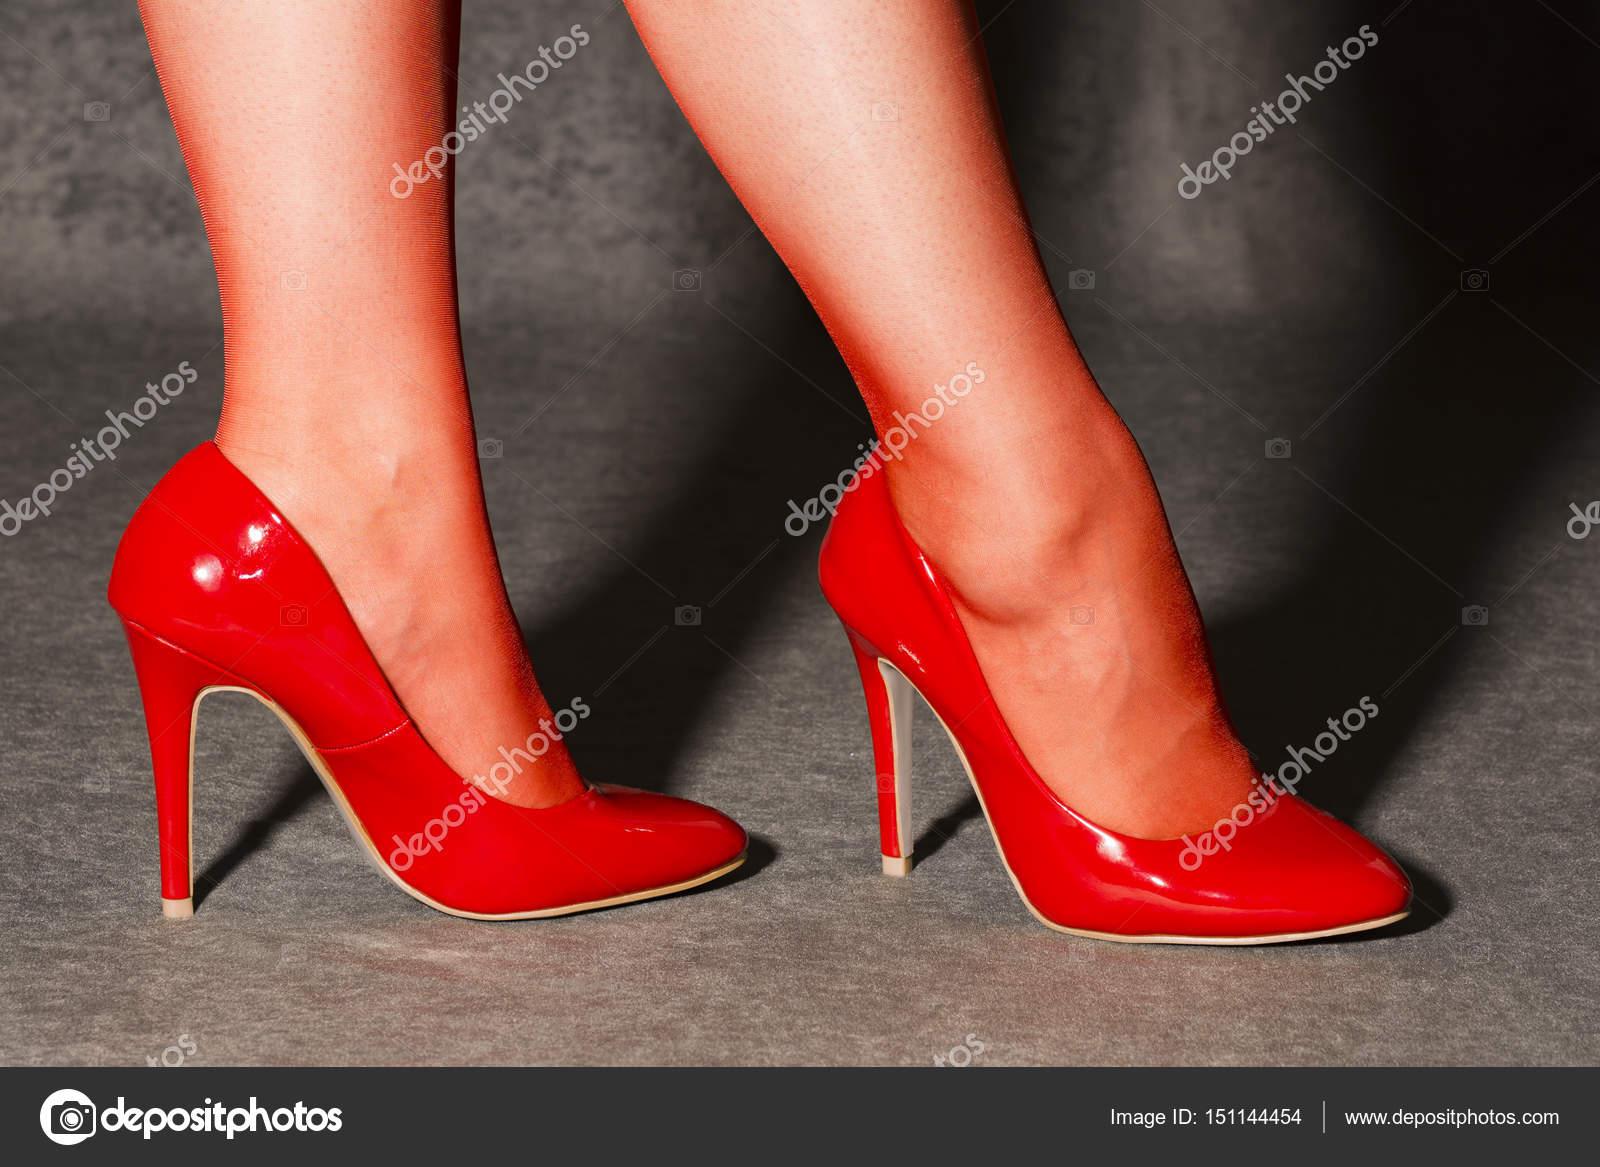 Sexy Zapatos Sexy Rojos Rojos Sexy Zapatos Zapatos Zapatos Rojos Sexy Rojos Sexy Zapatos q4Wtw1Hv